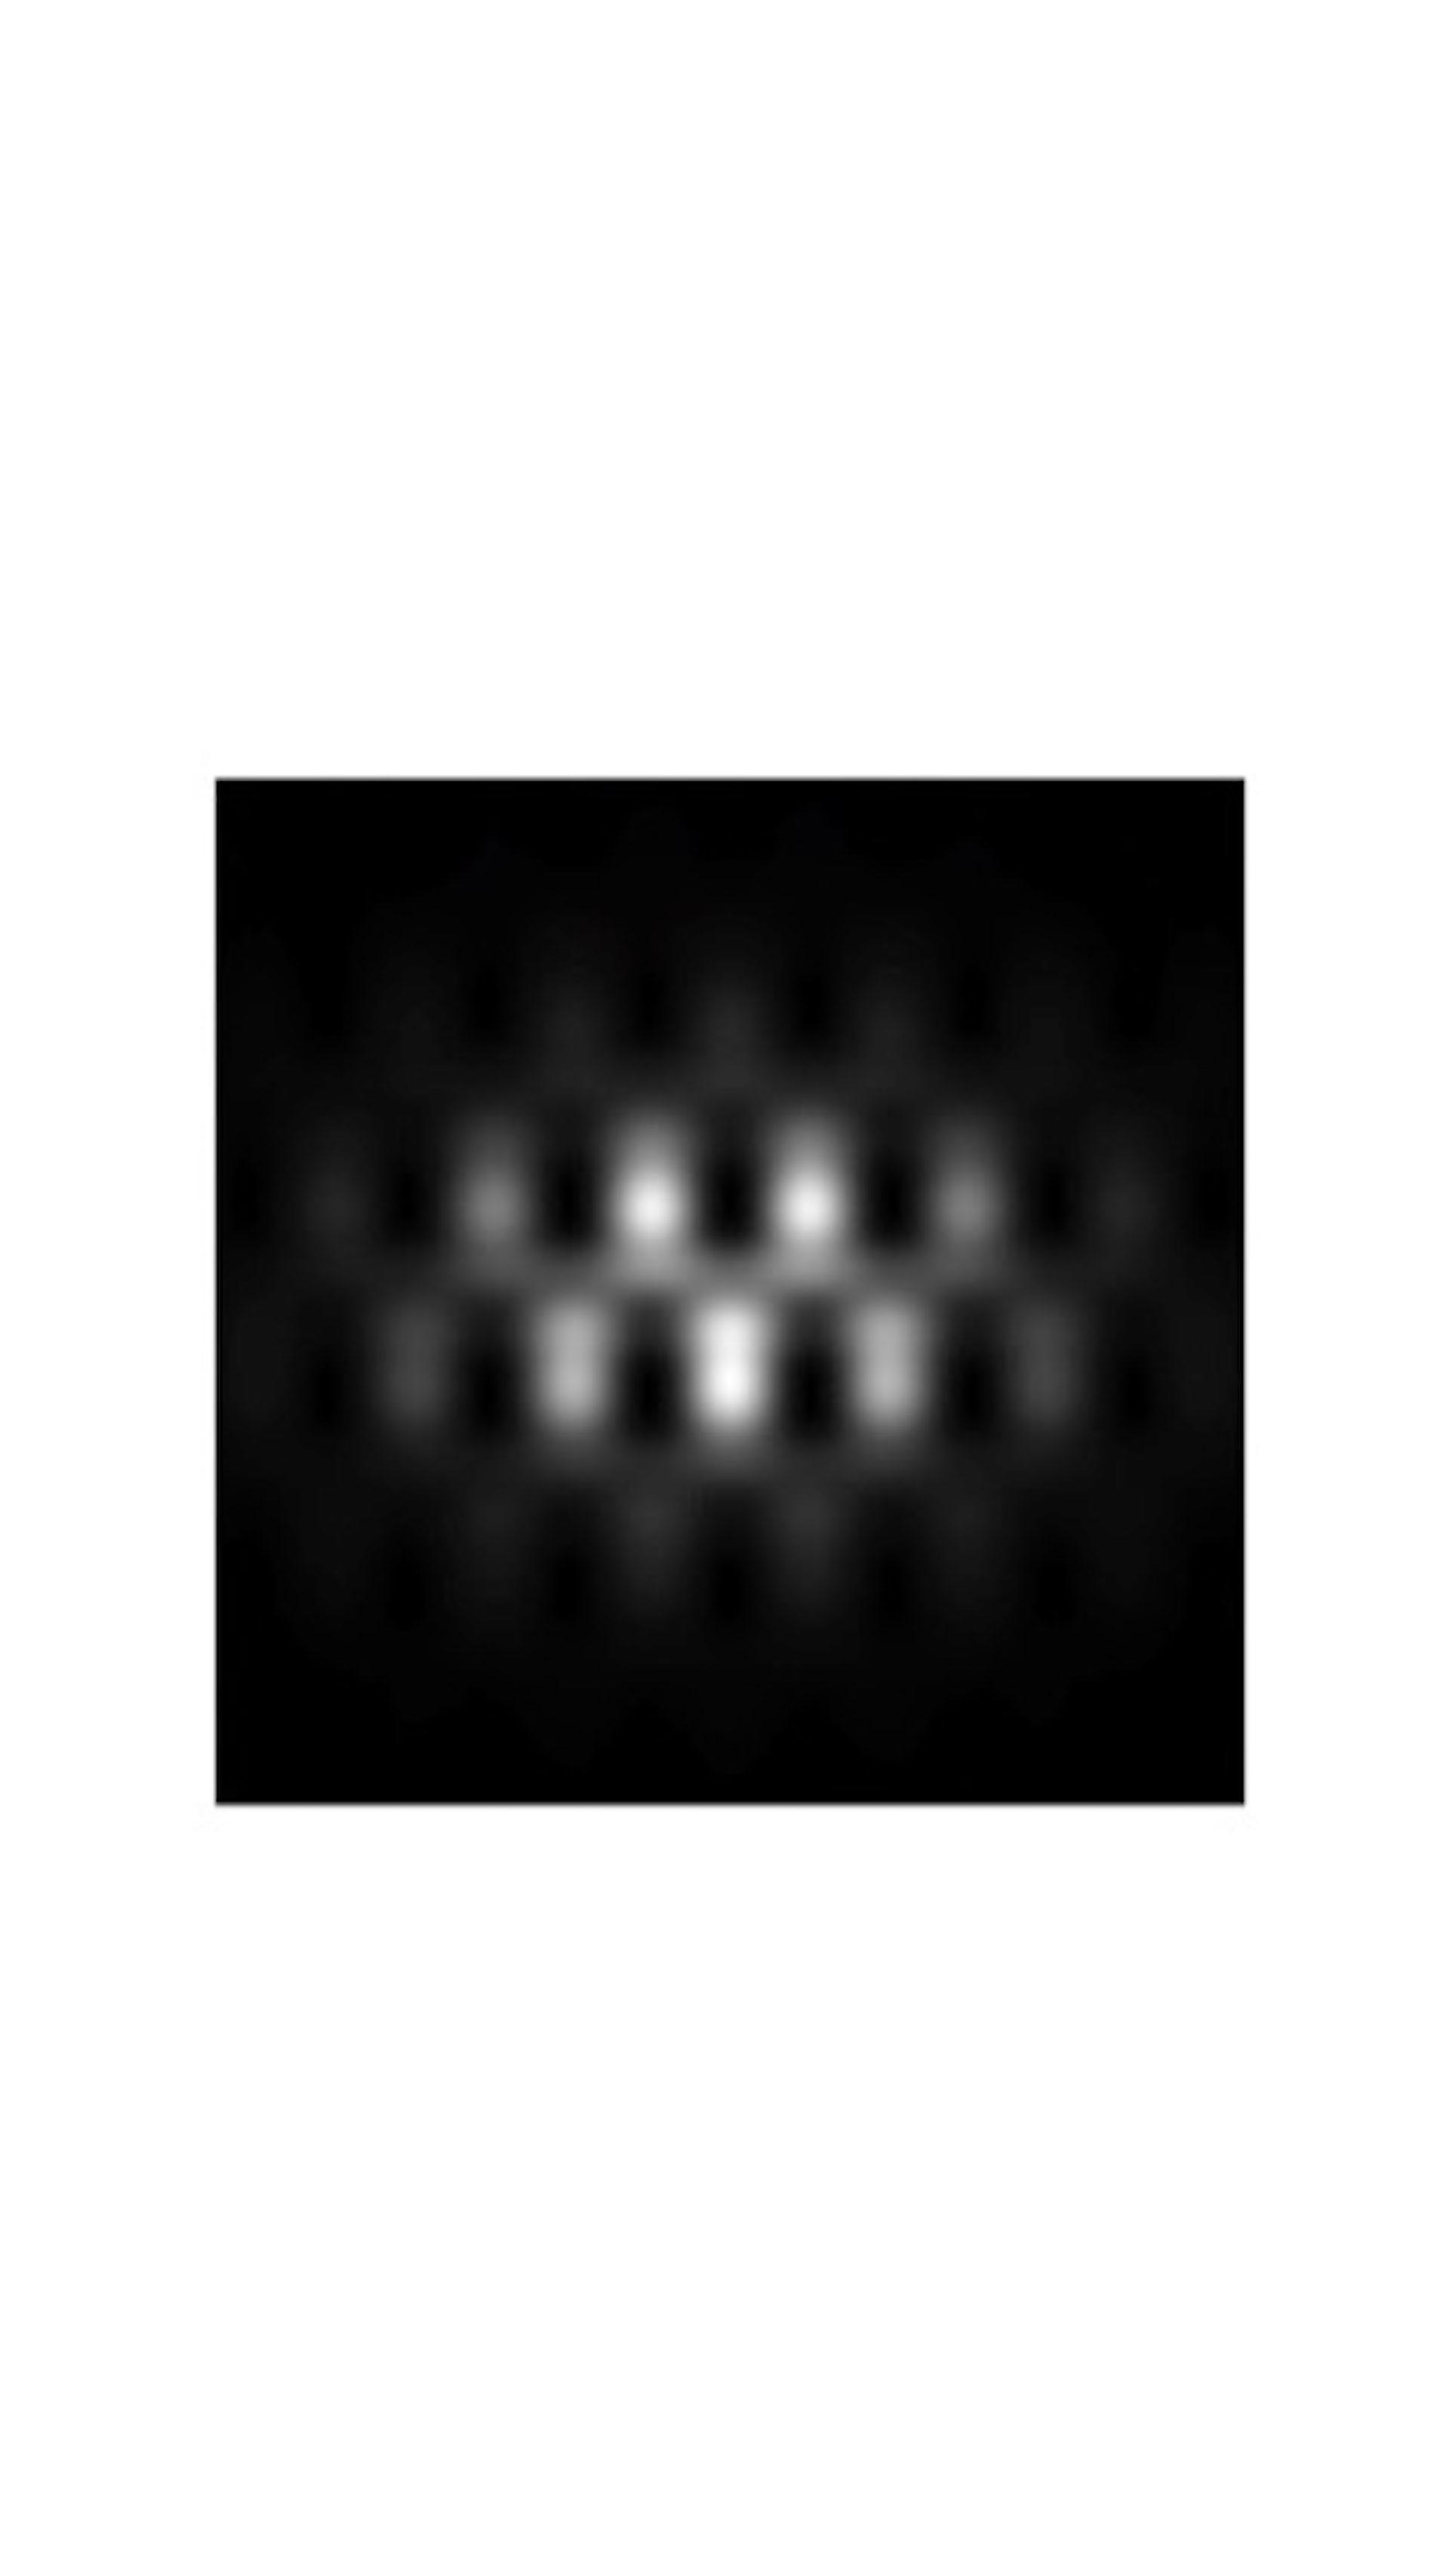 Image 20161007 21414 ajgt9v.jpg?ixlib=rb 1.1